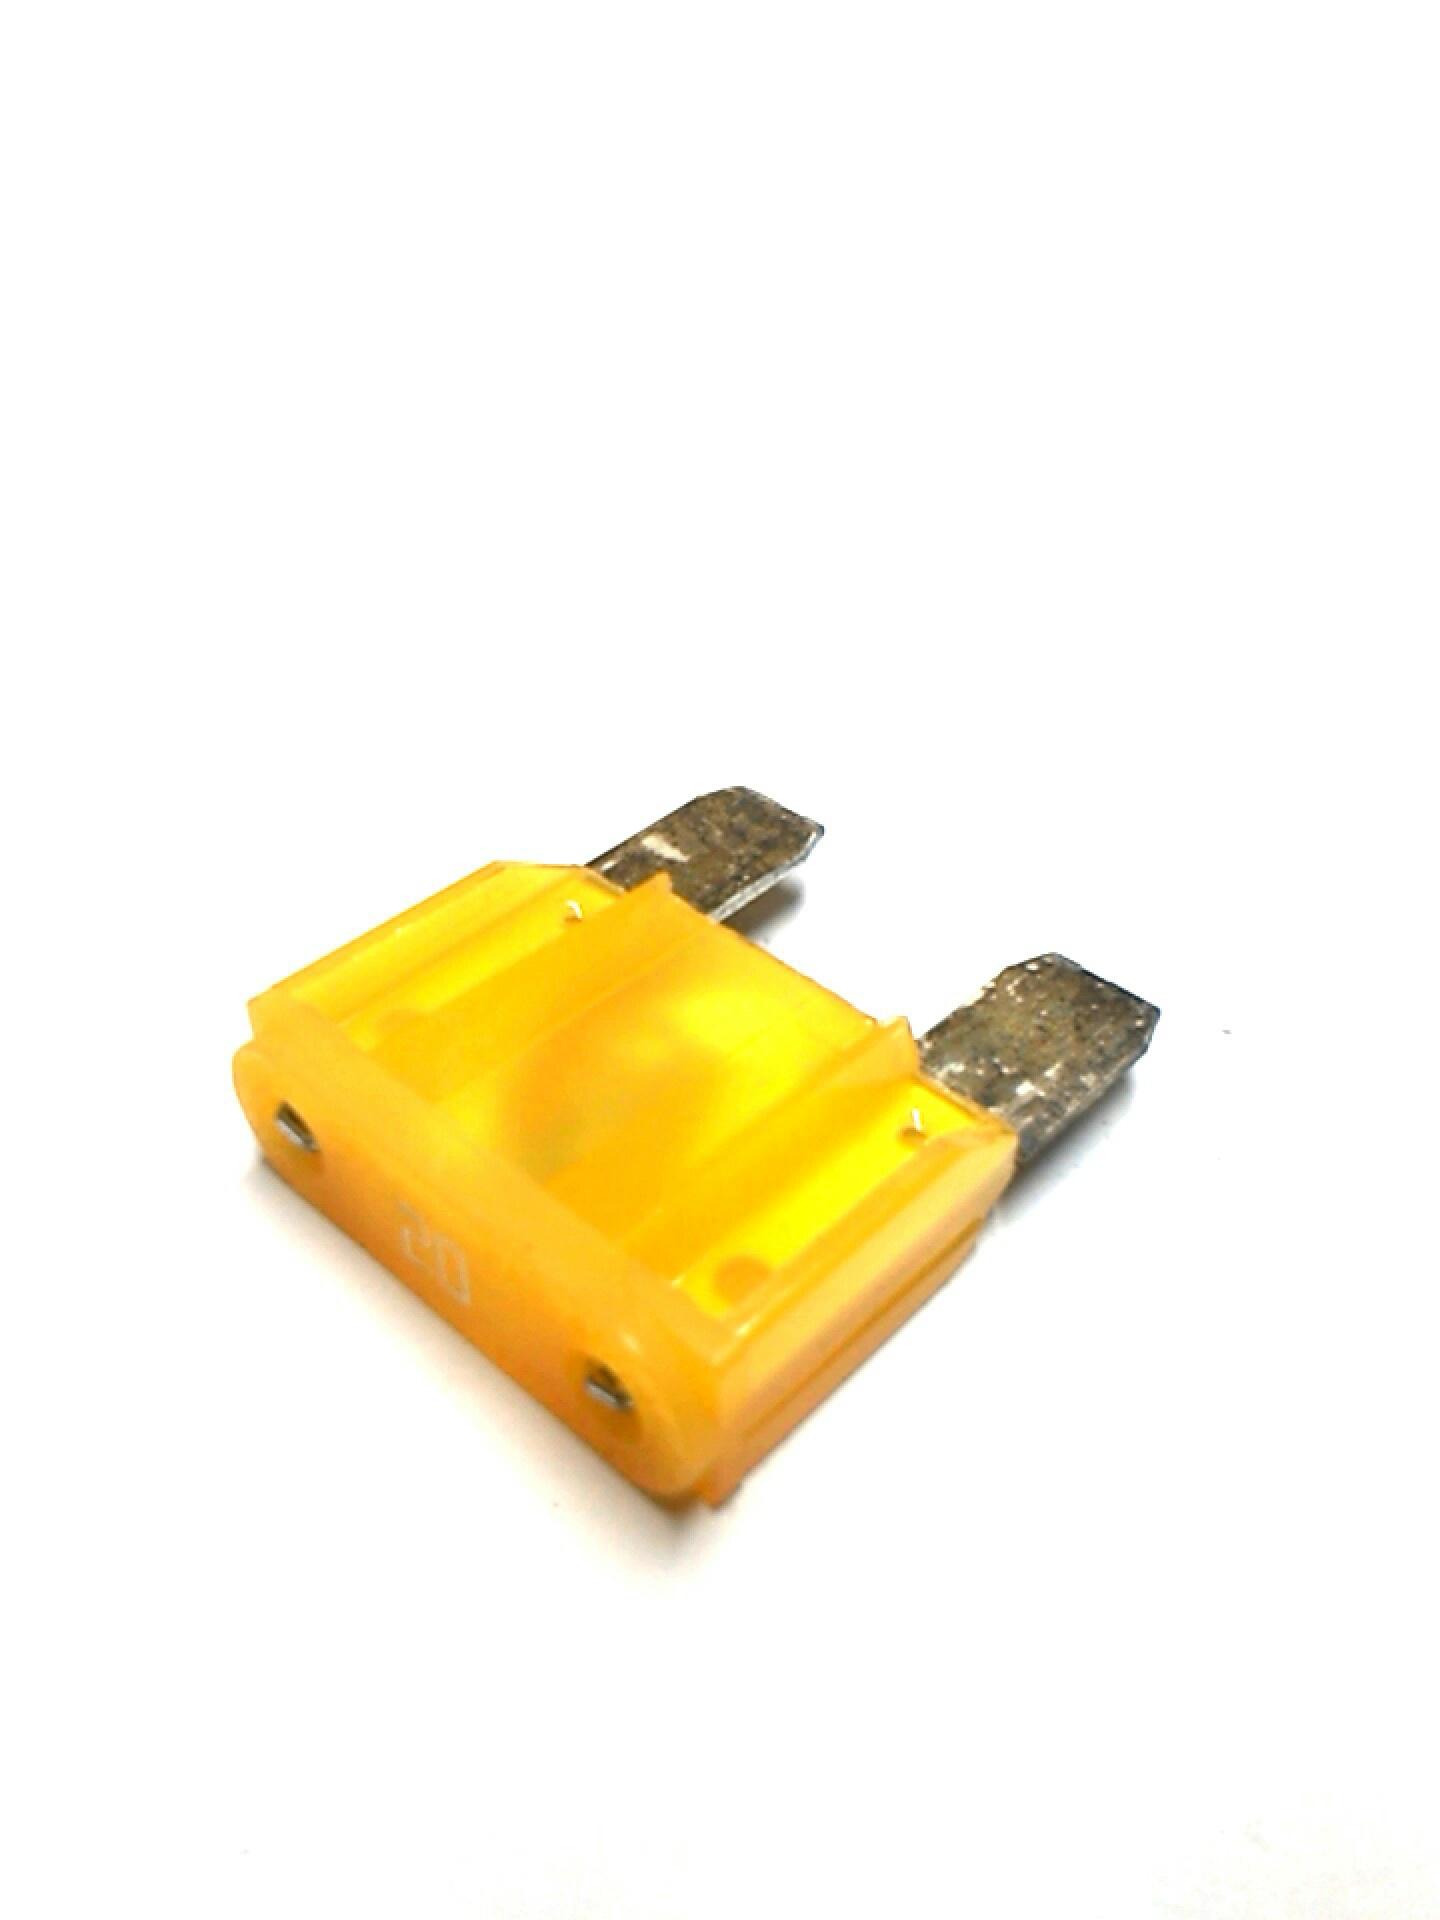 bmw edrive 1 fuse maxi yellow 20a fuses sign allocat. Black Bedroom Furniture Sets. Home Design Ideas